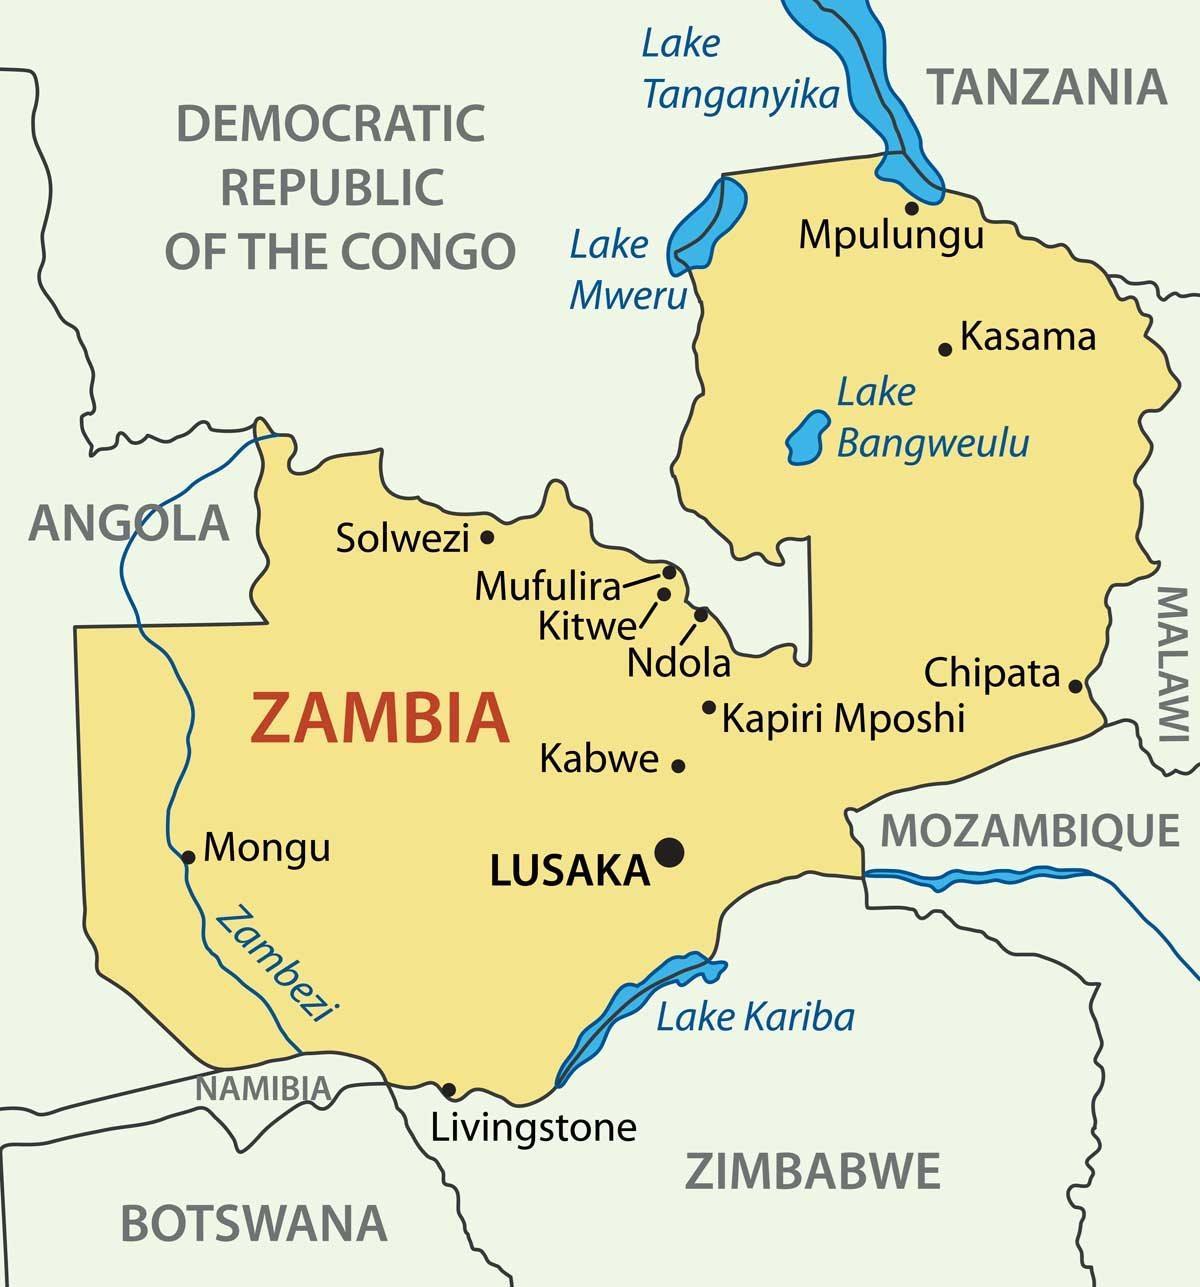 Lake Kariba Africa Map.Kitwe Zambia Map Map Of Kitwe Zambia Eastern Africa Africa